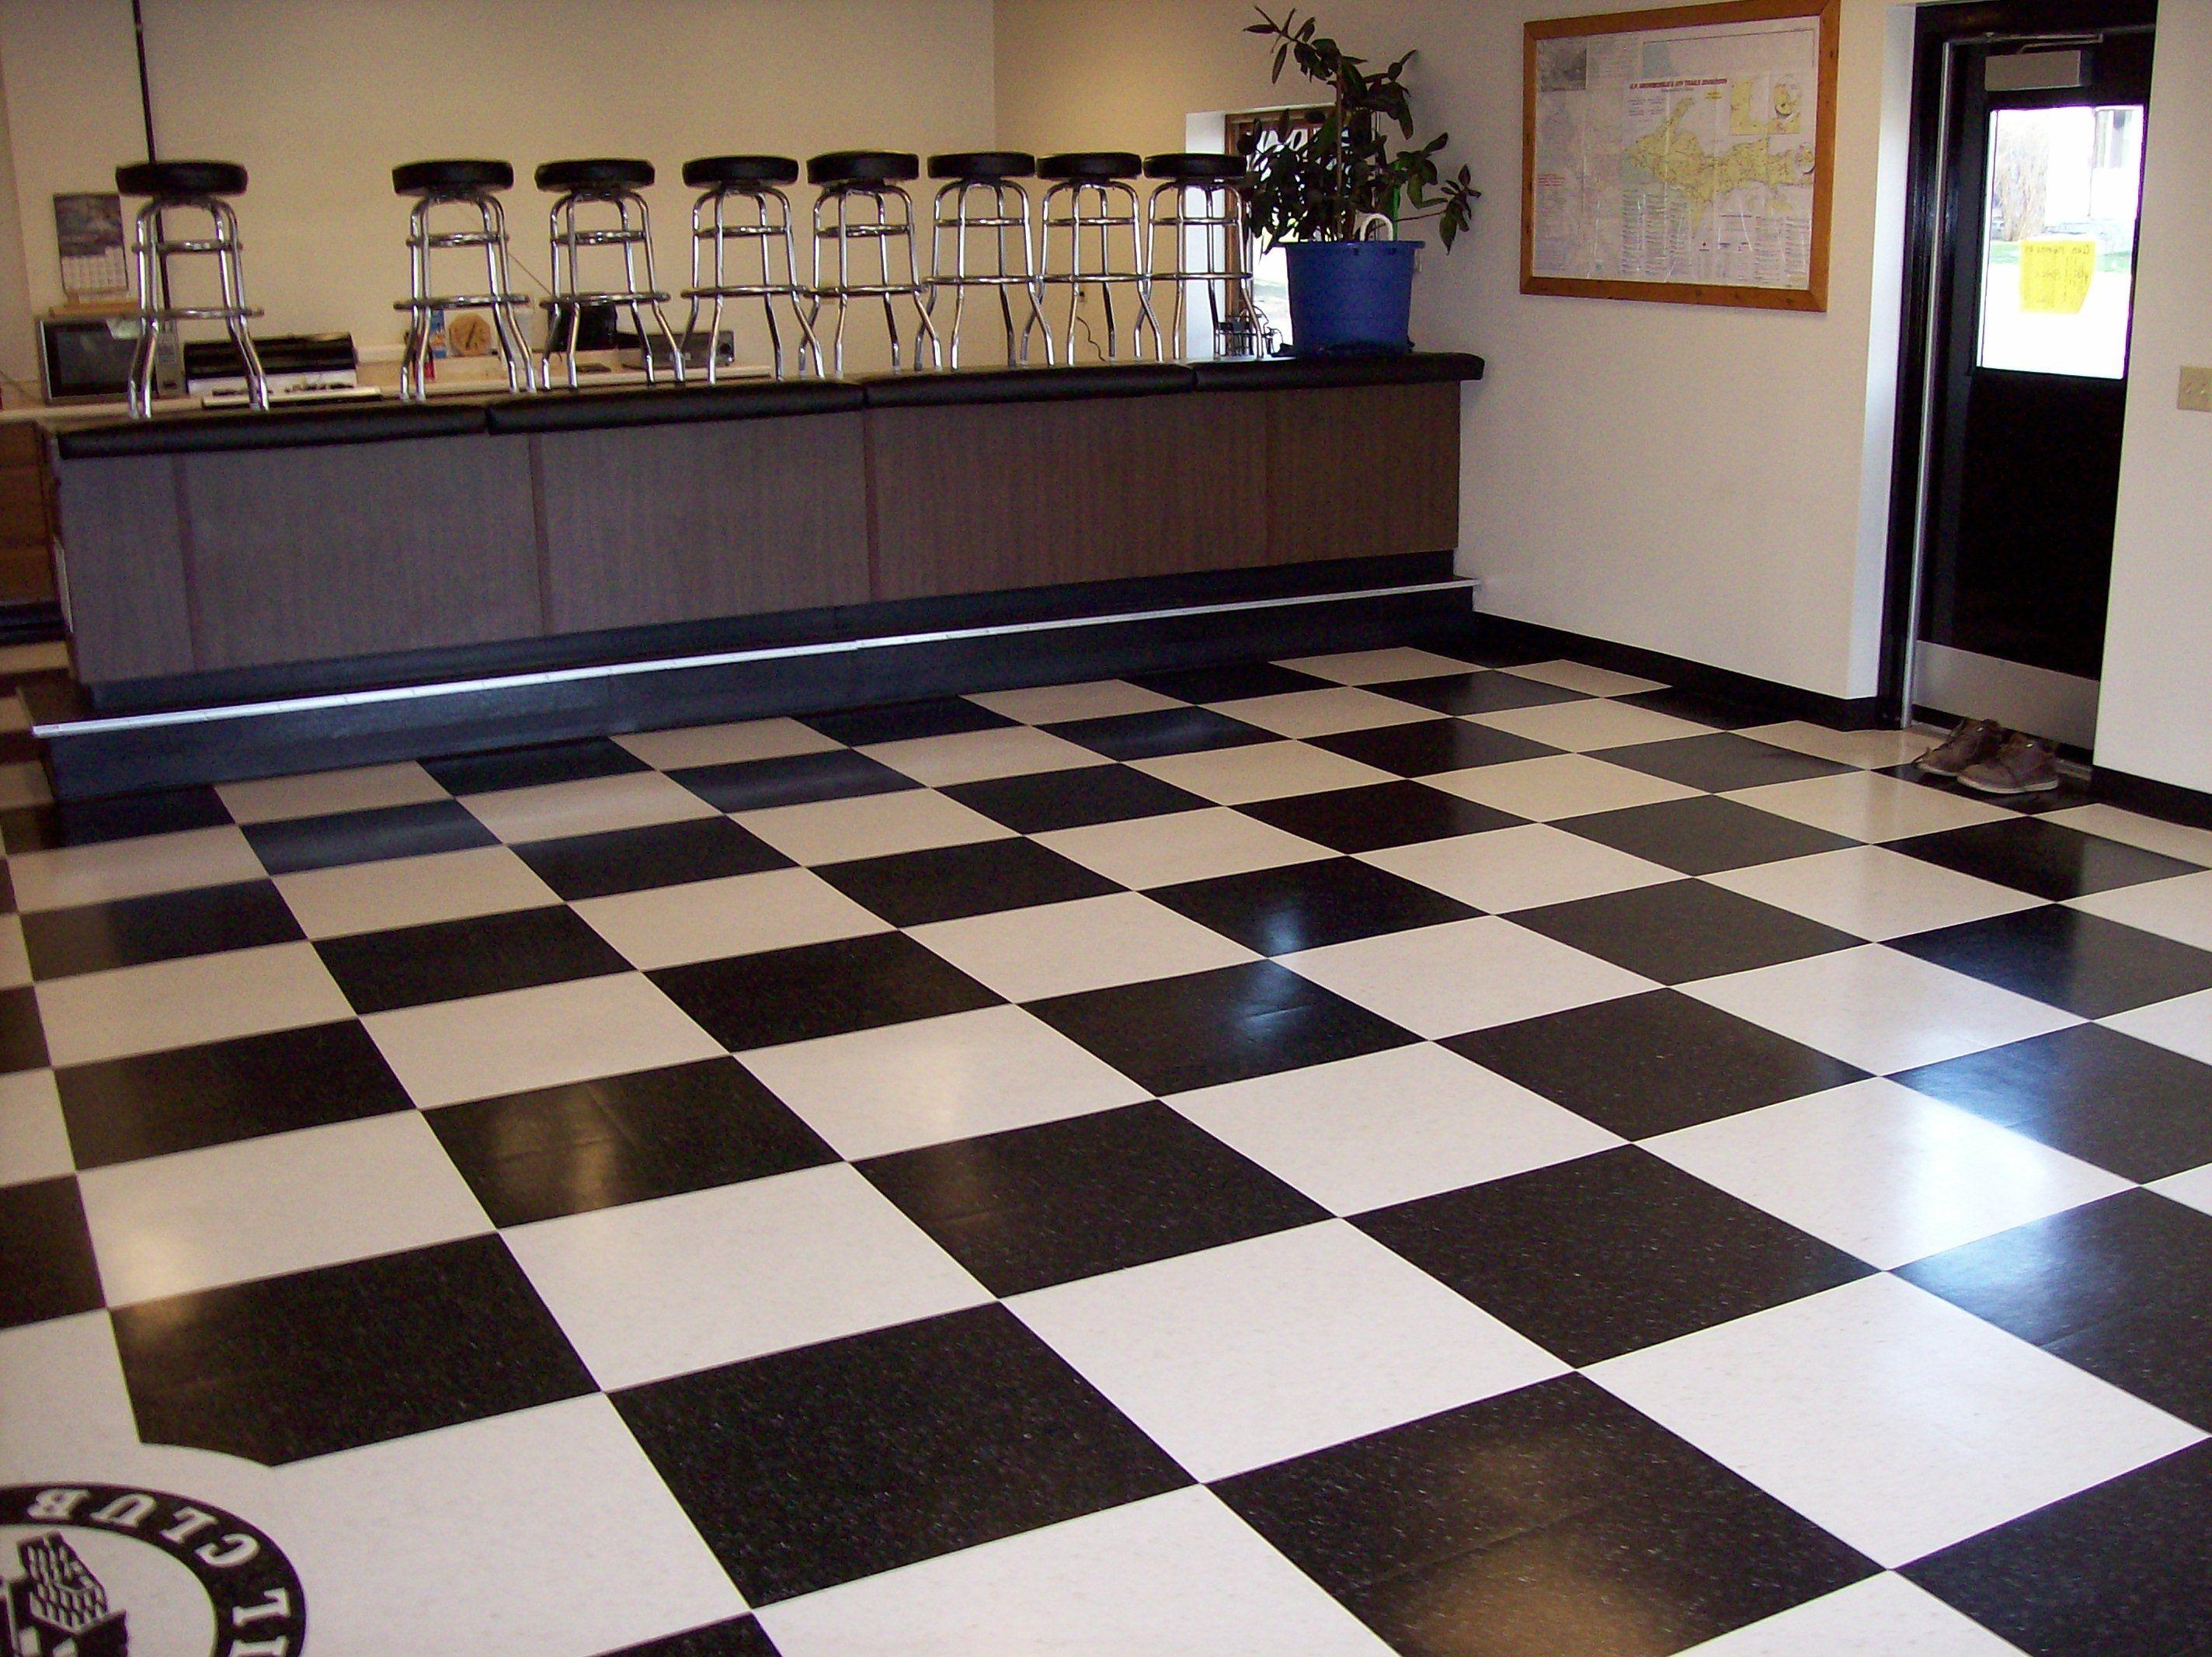 Checkerboard Floor Tile Patterns